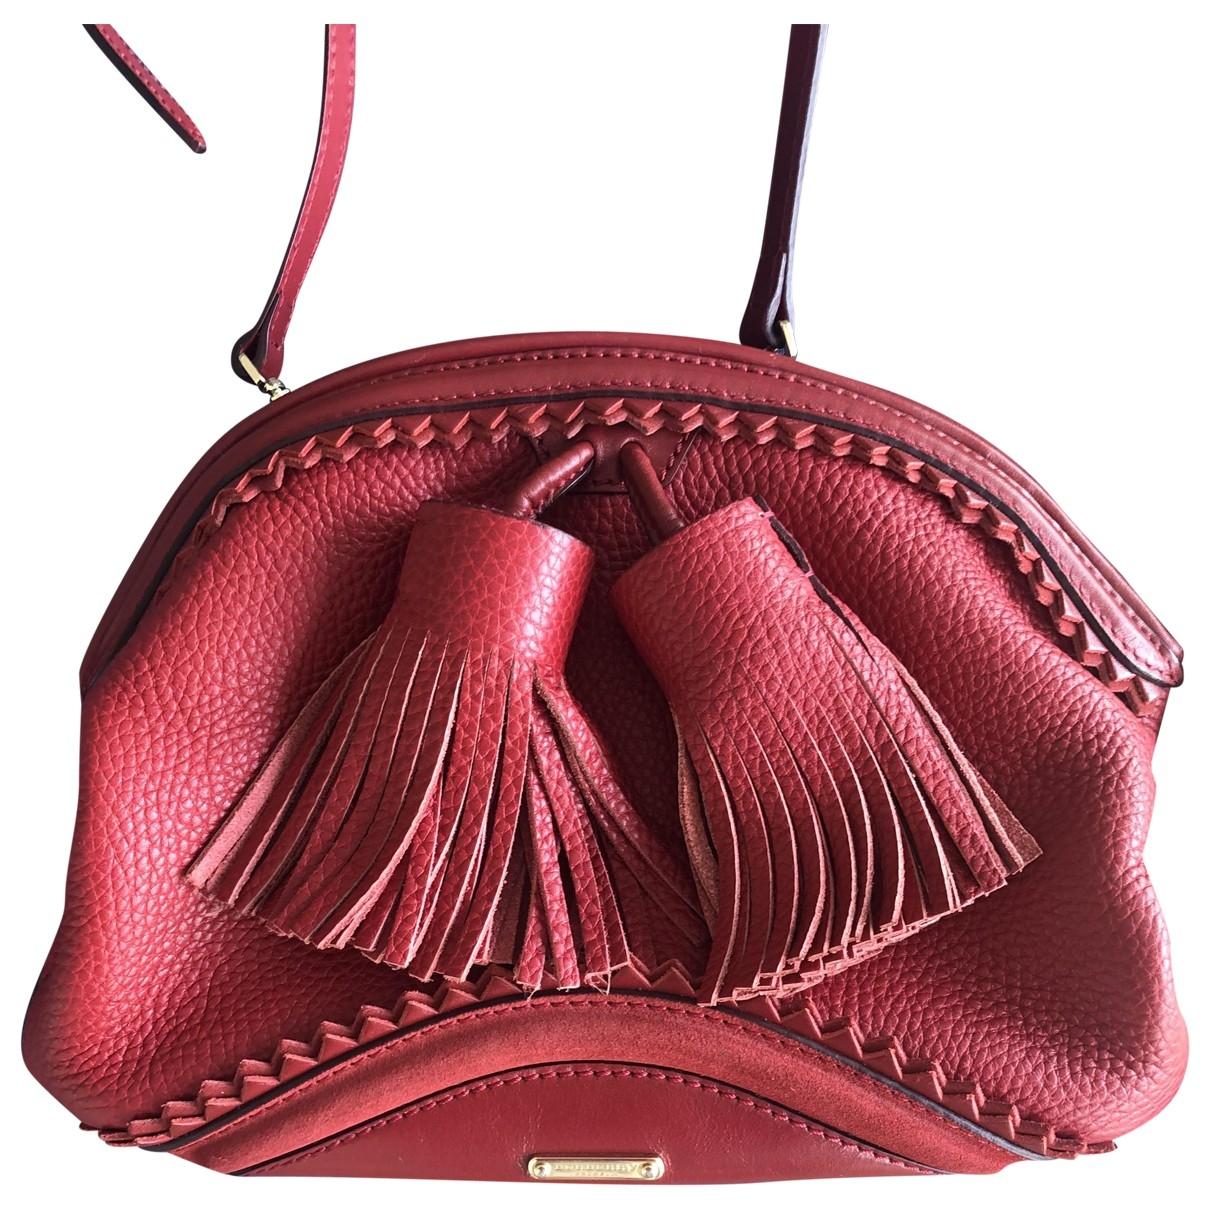 Burberry \N Burgundy Leather handbag for Women \N